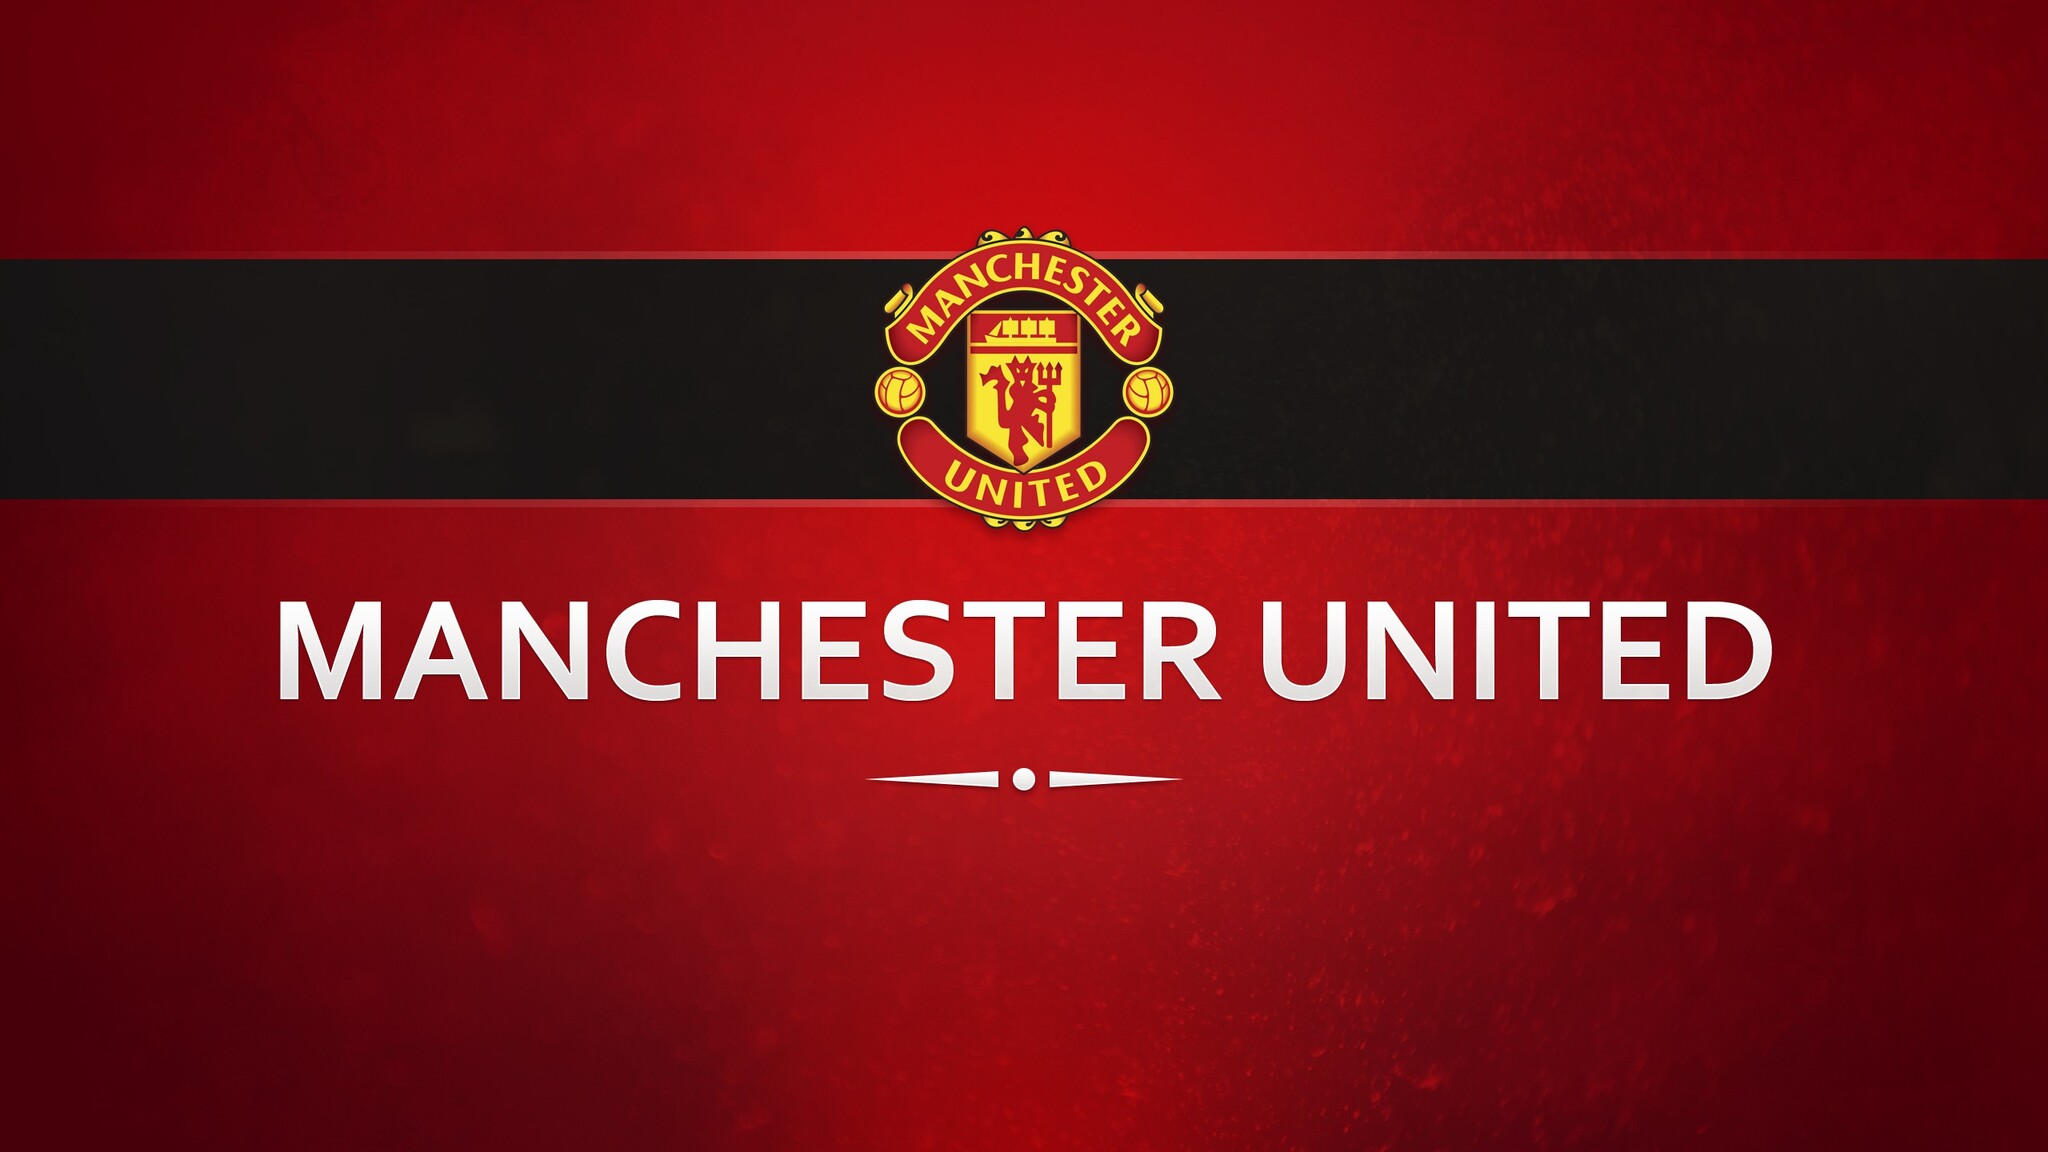 Manchester United Logo Wallpaper 3d 2048x1152 Manchester United 2048x1152 Resolution Hd 4k